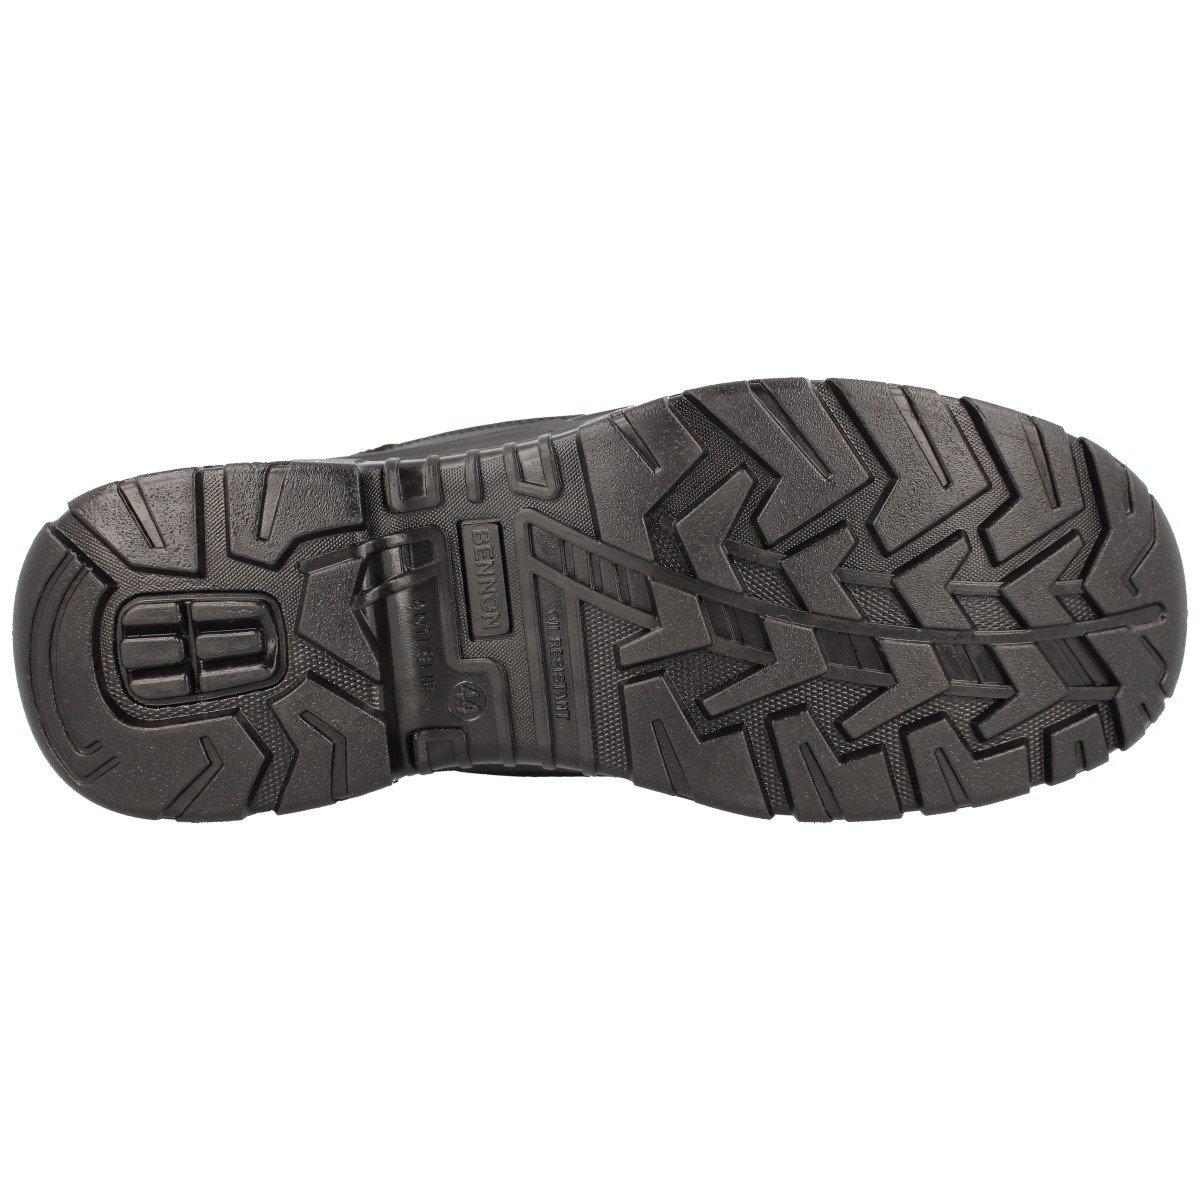 Buty Bennon Legatus XTR II O1 Black (Z90150)